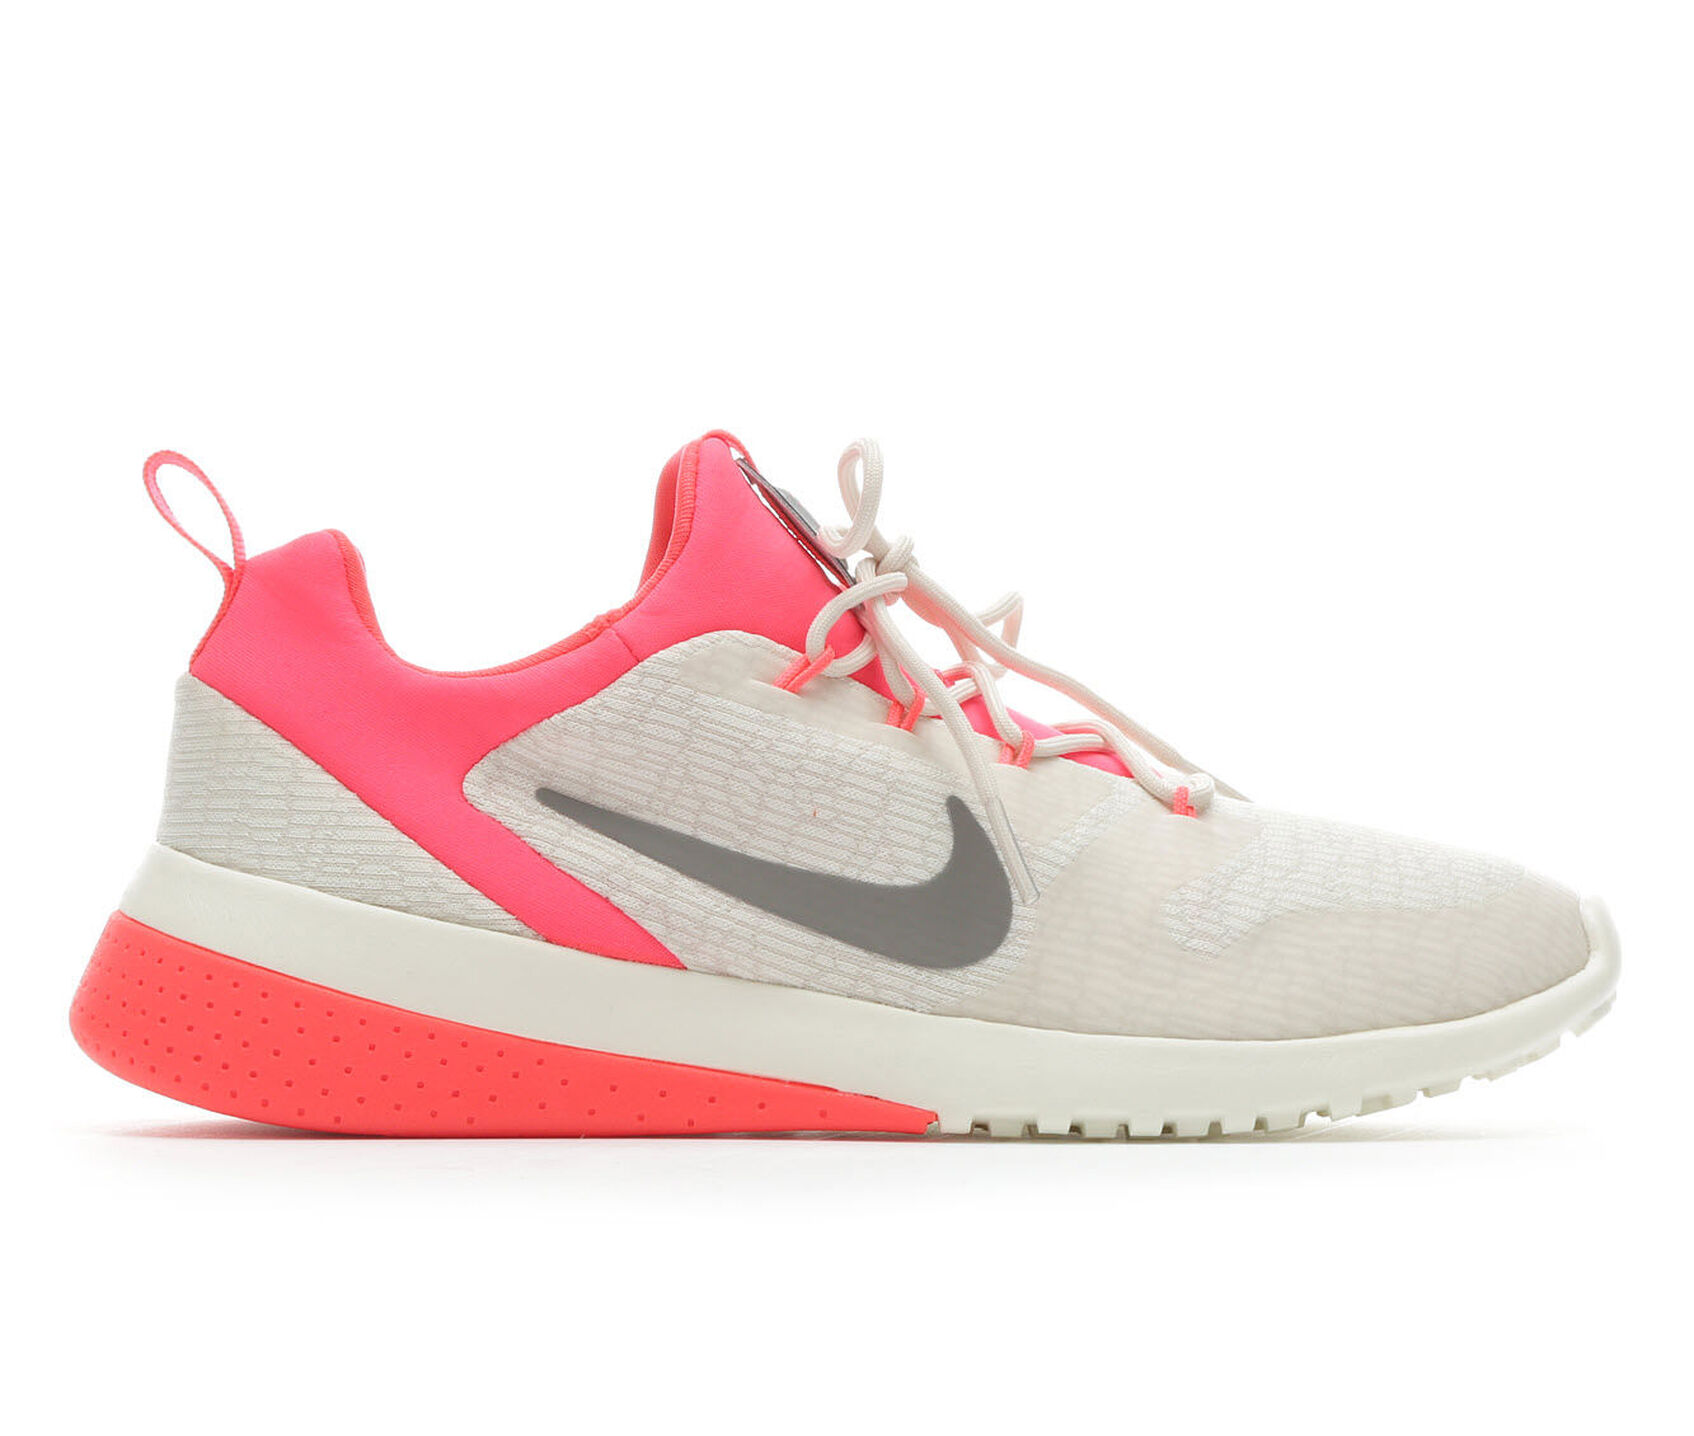 timeless design 863c1 092f6 Womens Nike CK Racer Sneakers